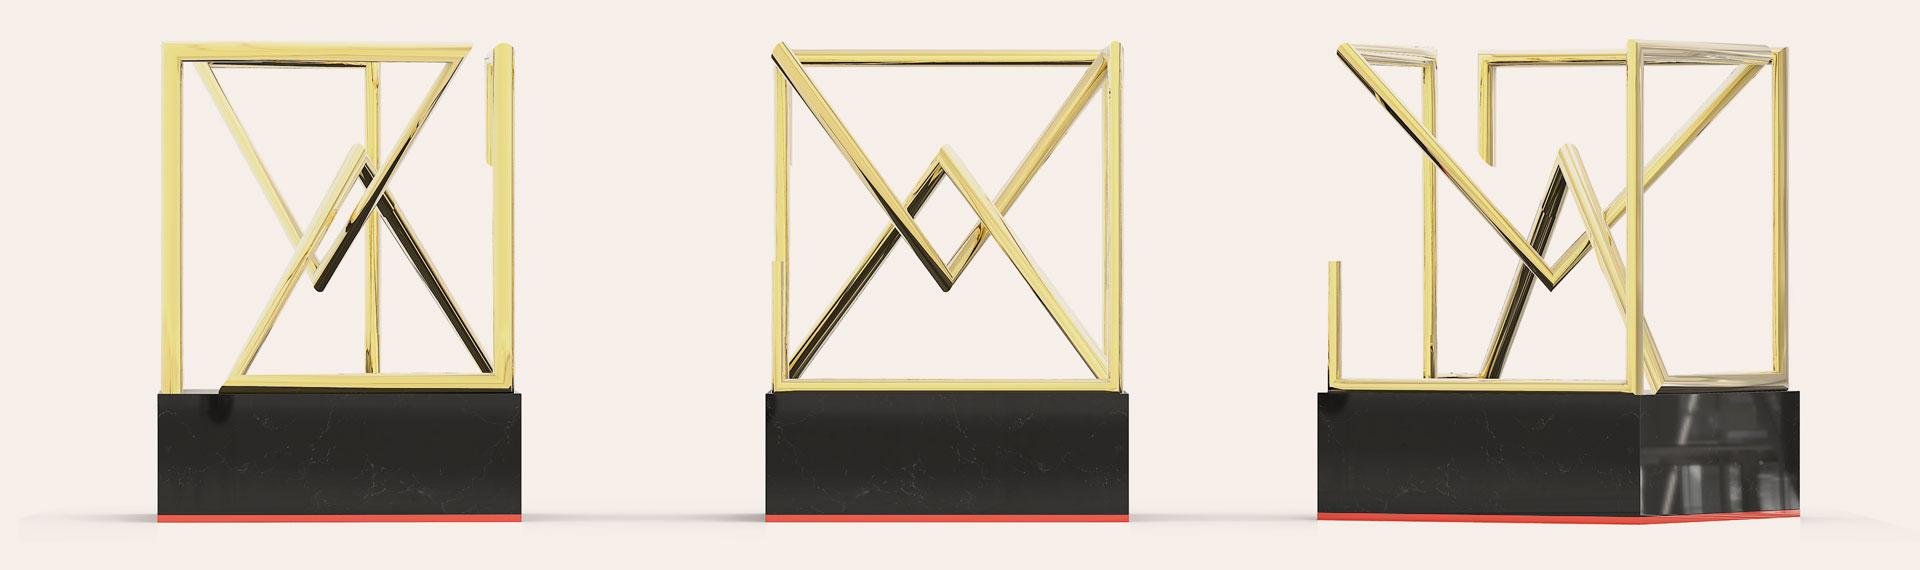 Motionographer-Awards-Cube-1.jpg